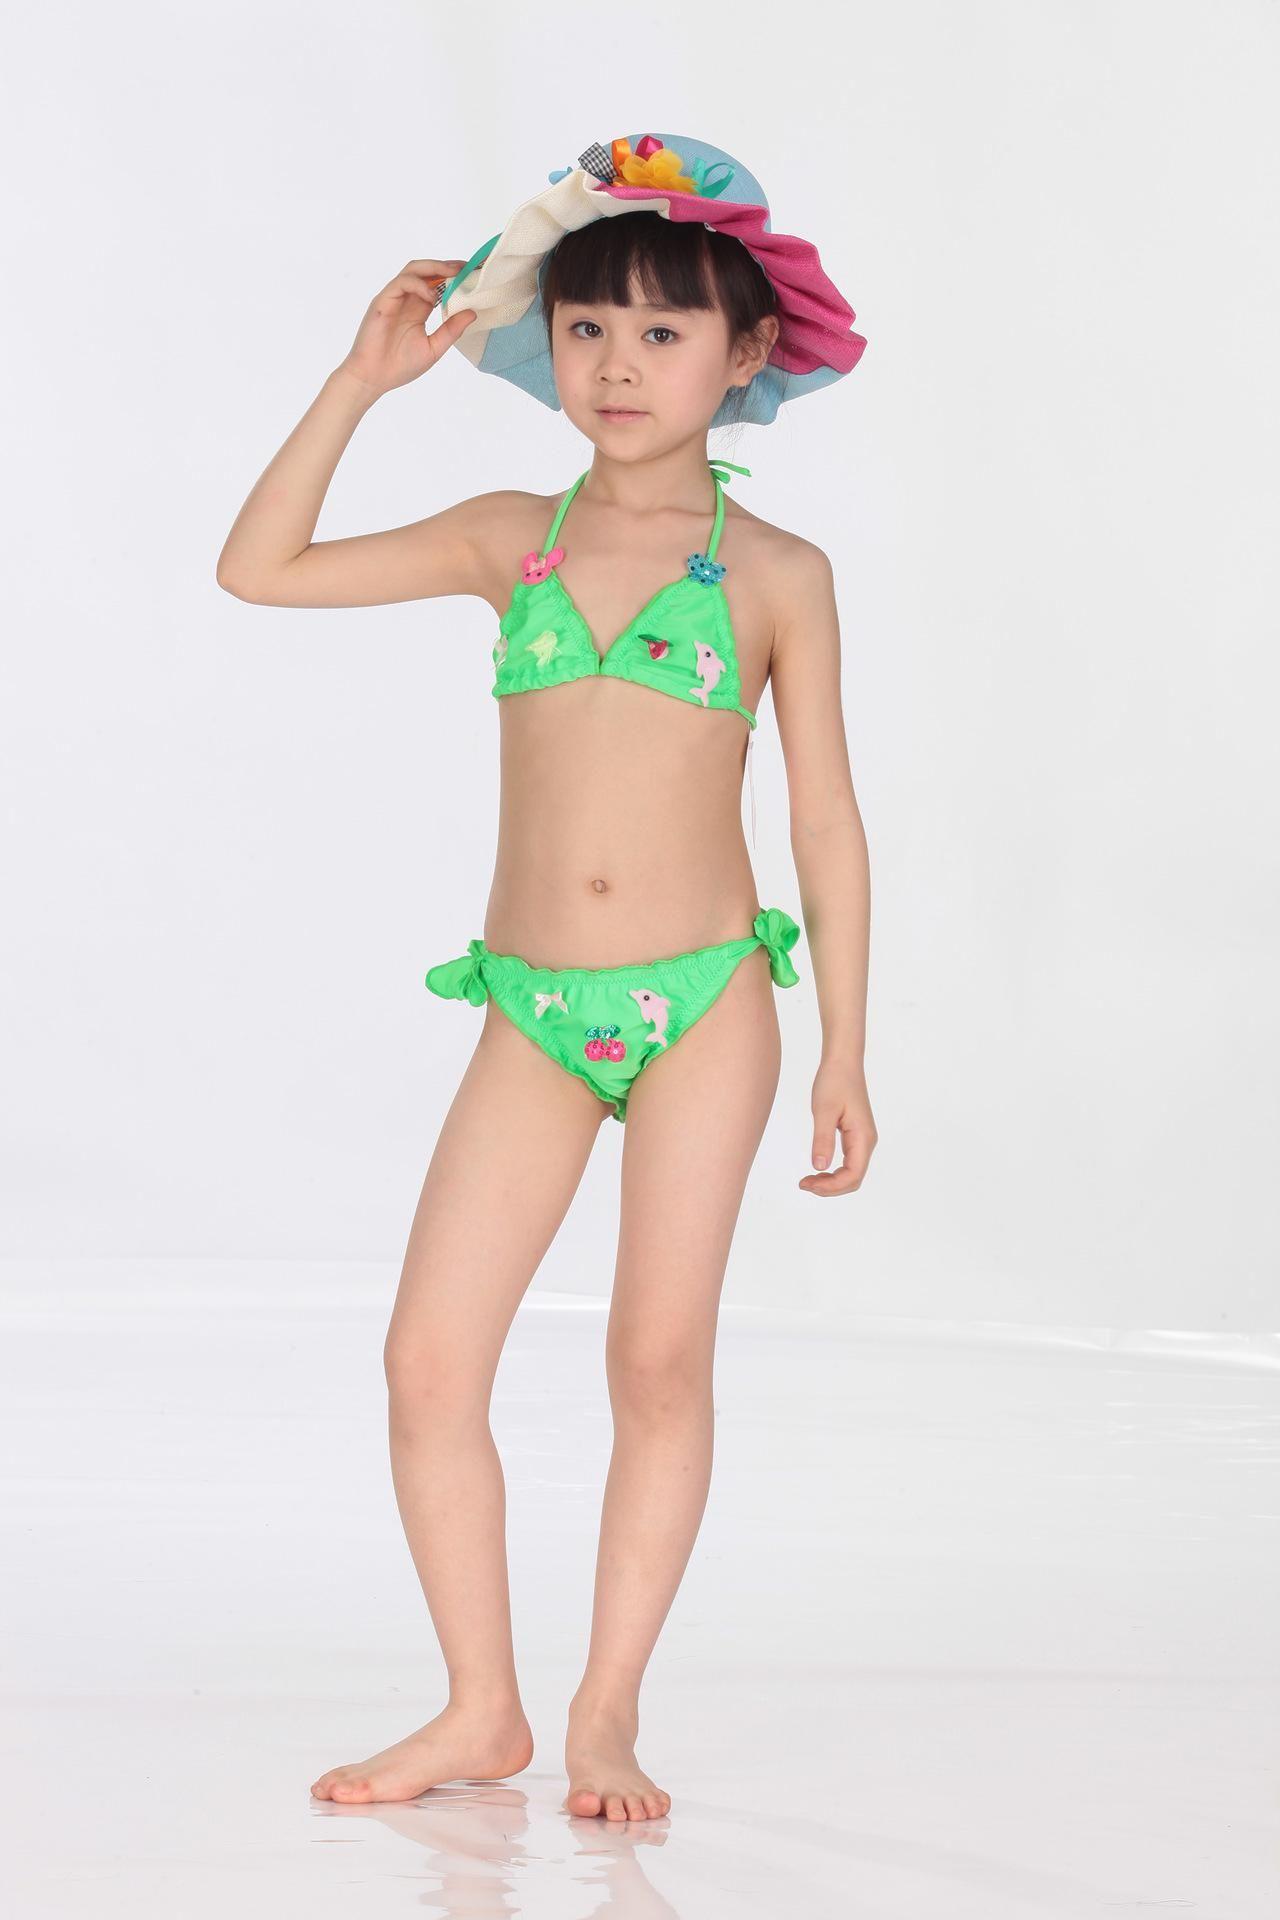 0745f09055e68 Swimming Wear Kids Girls Swim Fashion Minnie Swimsuit Girls Bikini Swim  Bathing Suit Butterfly Bow Fish Dolphin Swimsuit A662 Juniors Swimwear  Wholesale ...